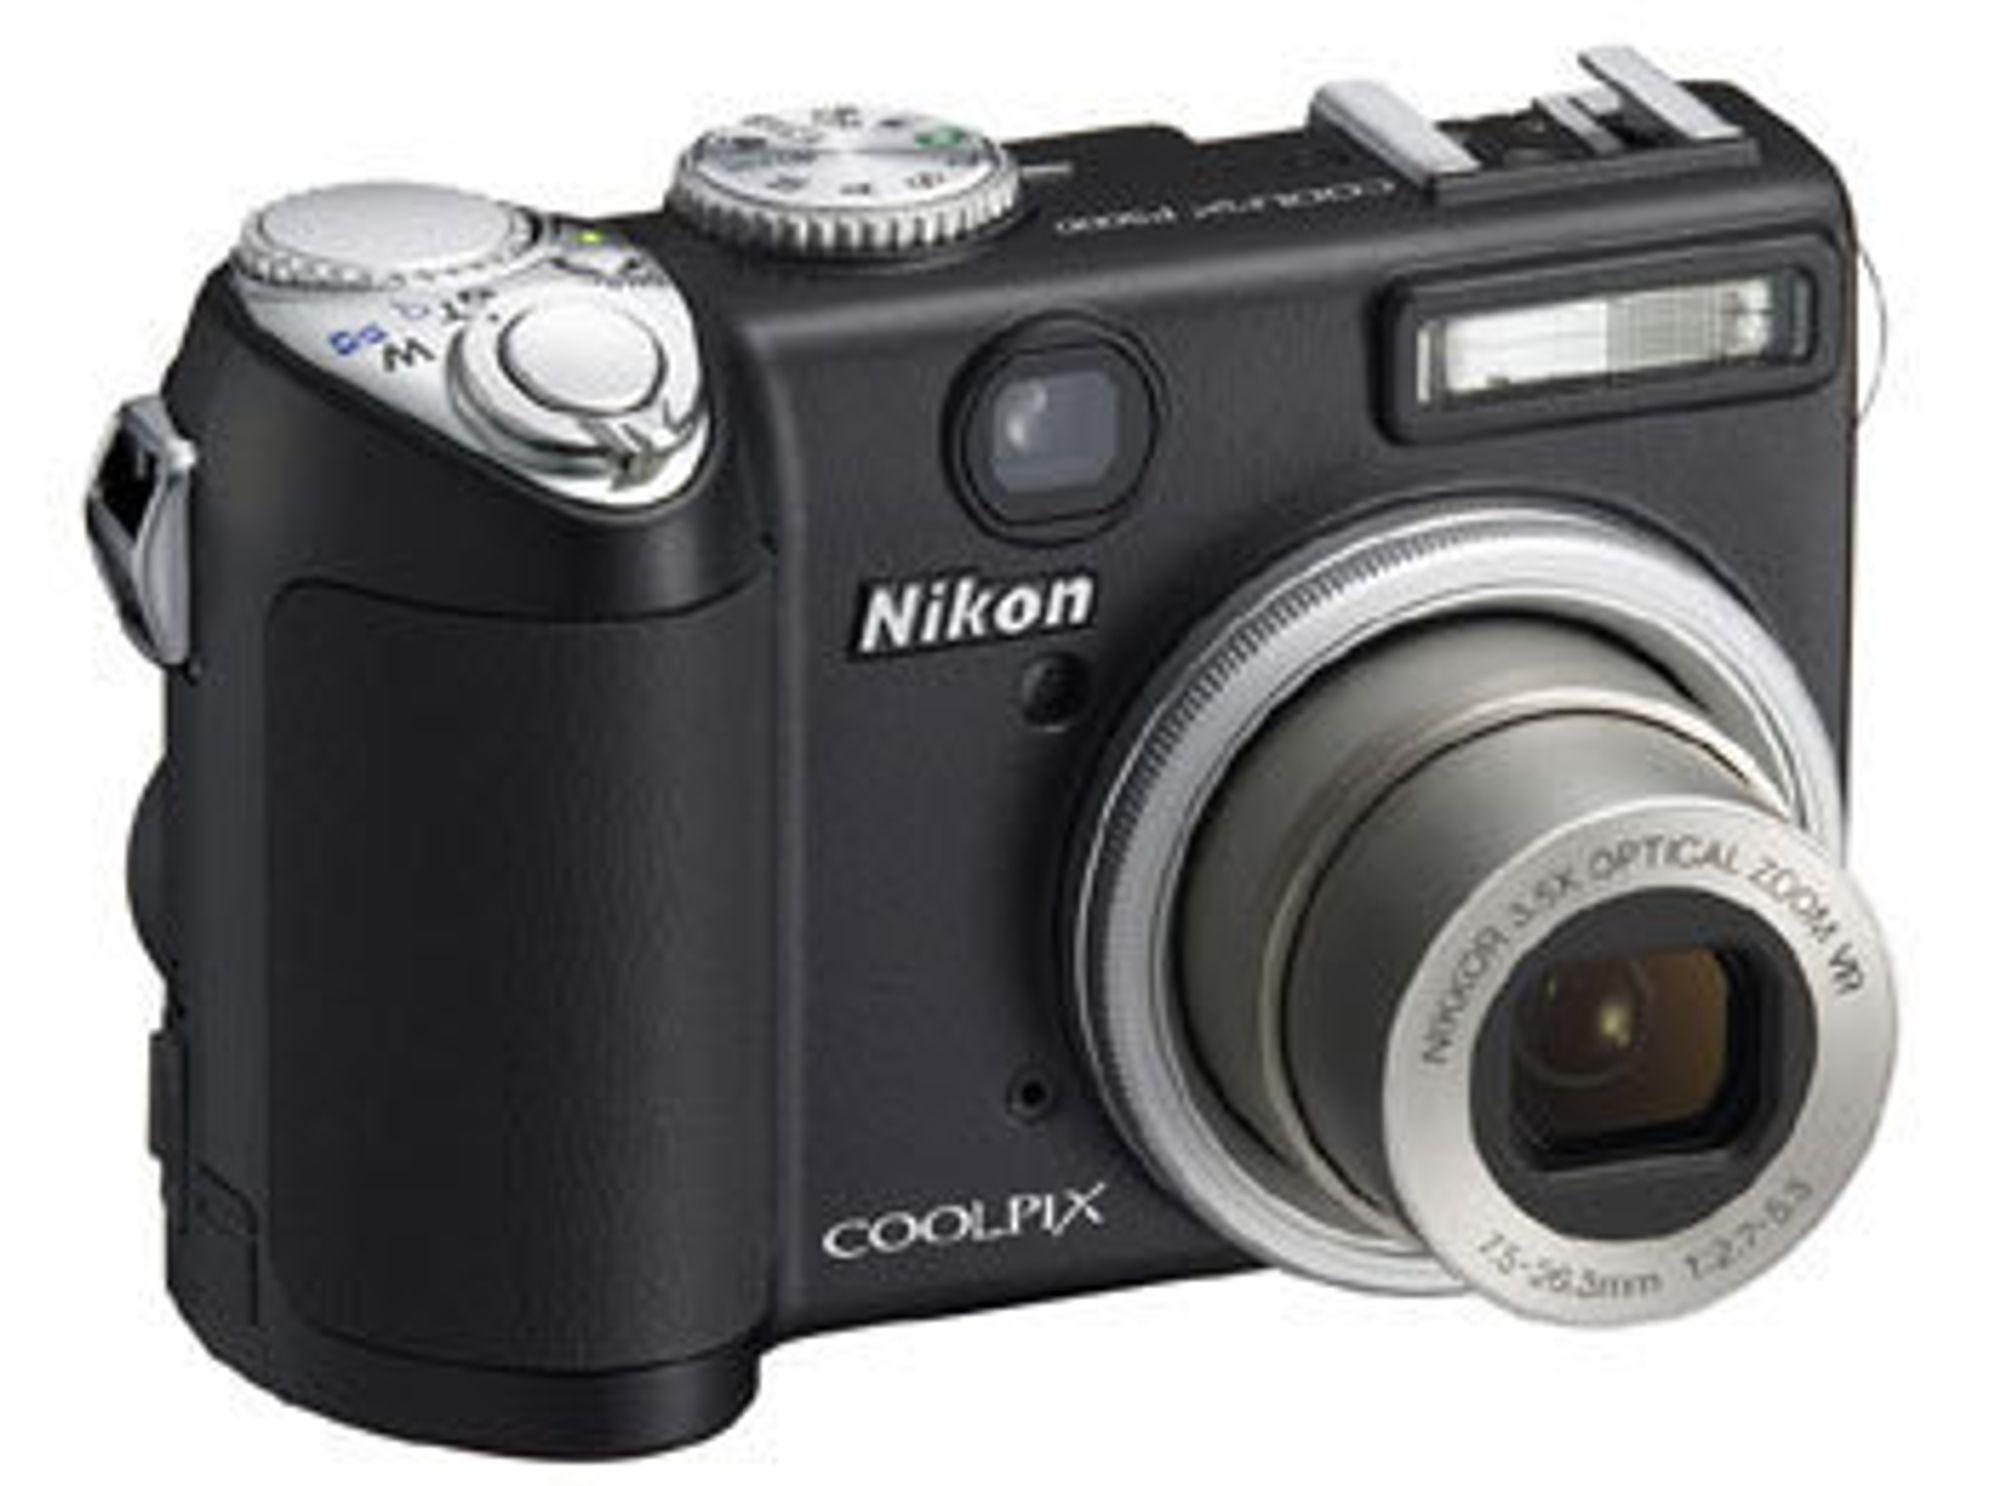 Nikon Coolpix  P5000. Digitalt kamera. Speilrefleks. Digitalkamera. Forbrukerteknologi. Piksler. Megapiksler. Objektiv. Minnebrikke. TIPA.